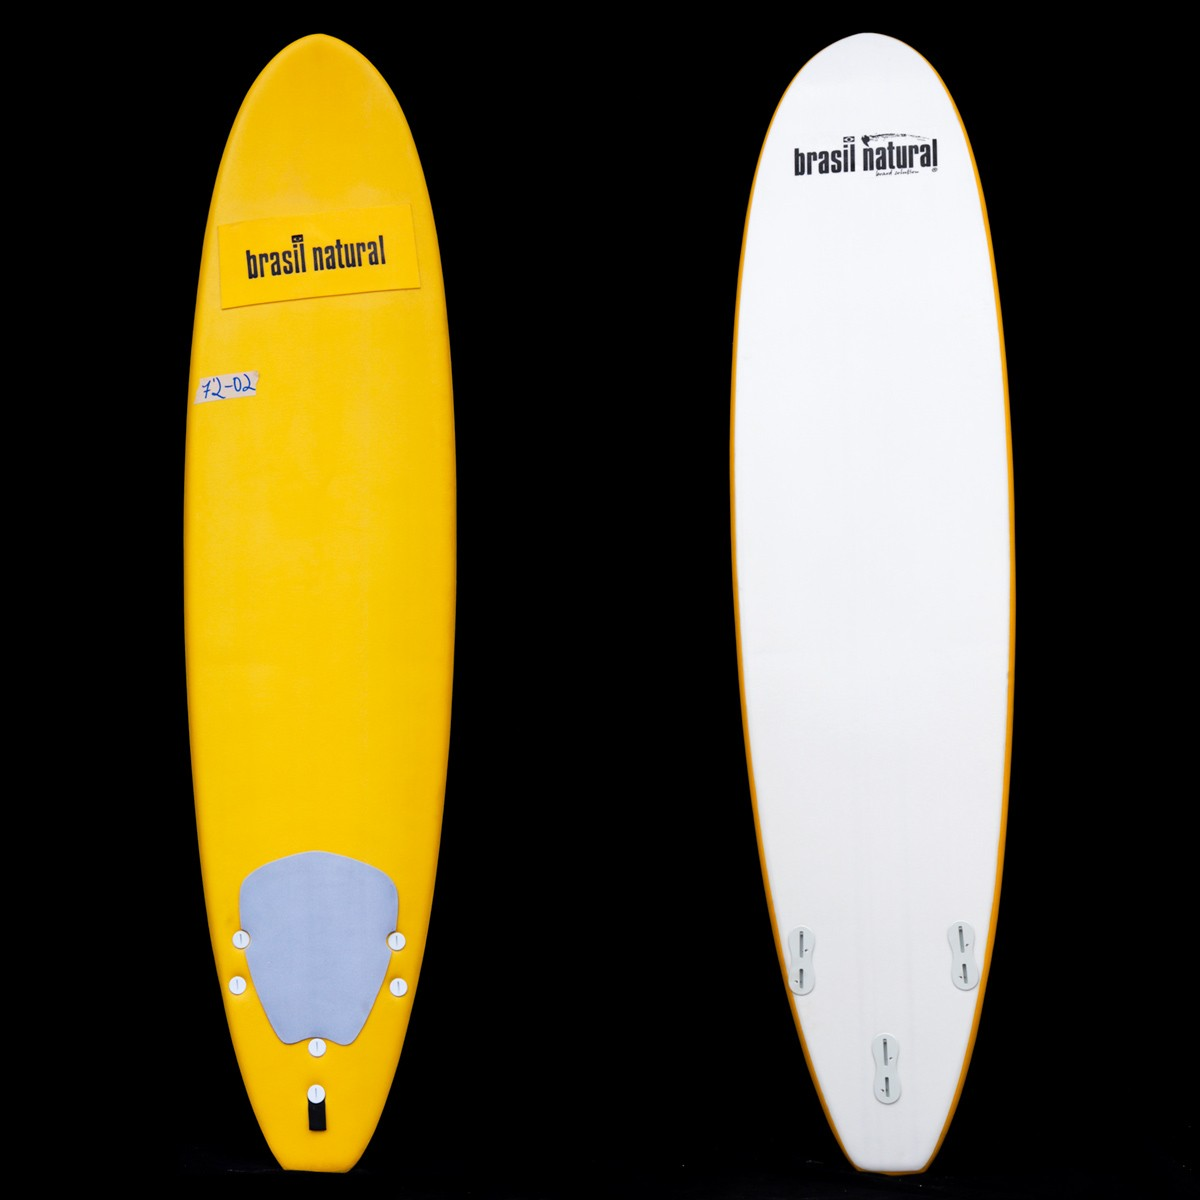 Prancha de surf fun board 7.2  - OUTLET 02